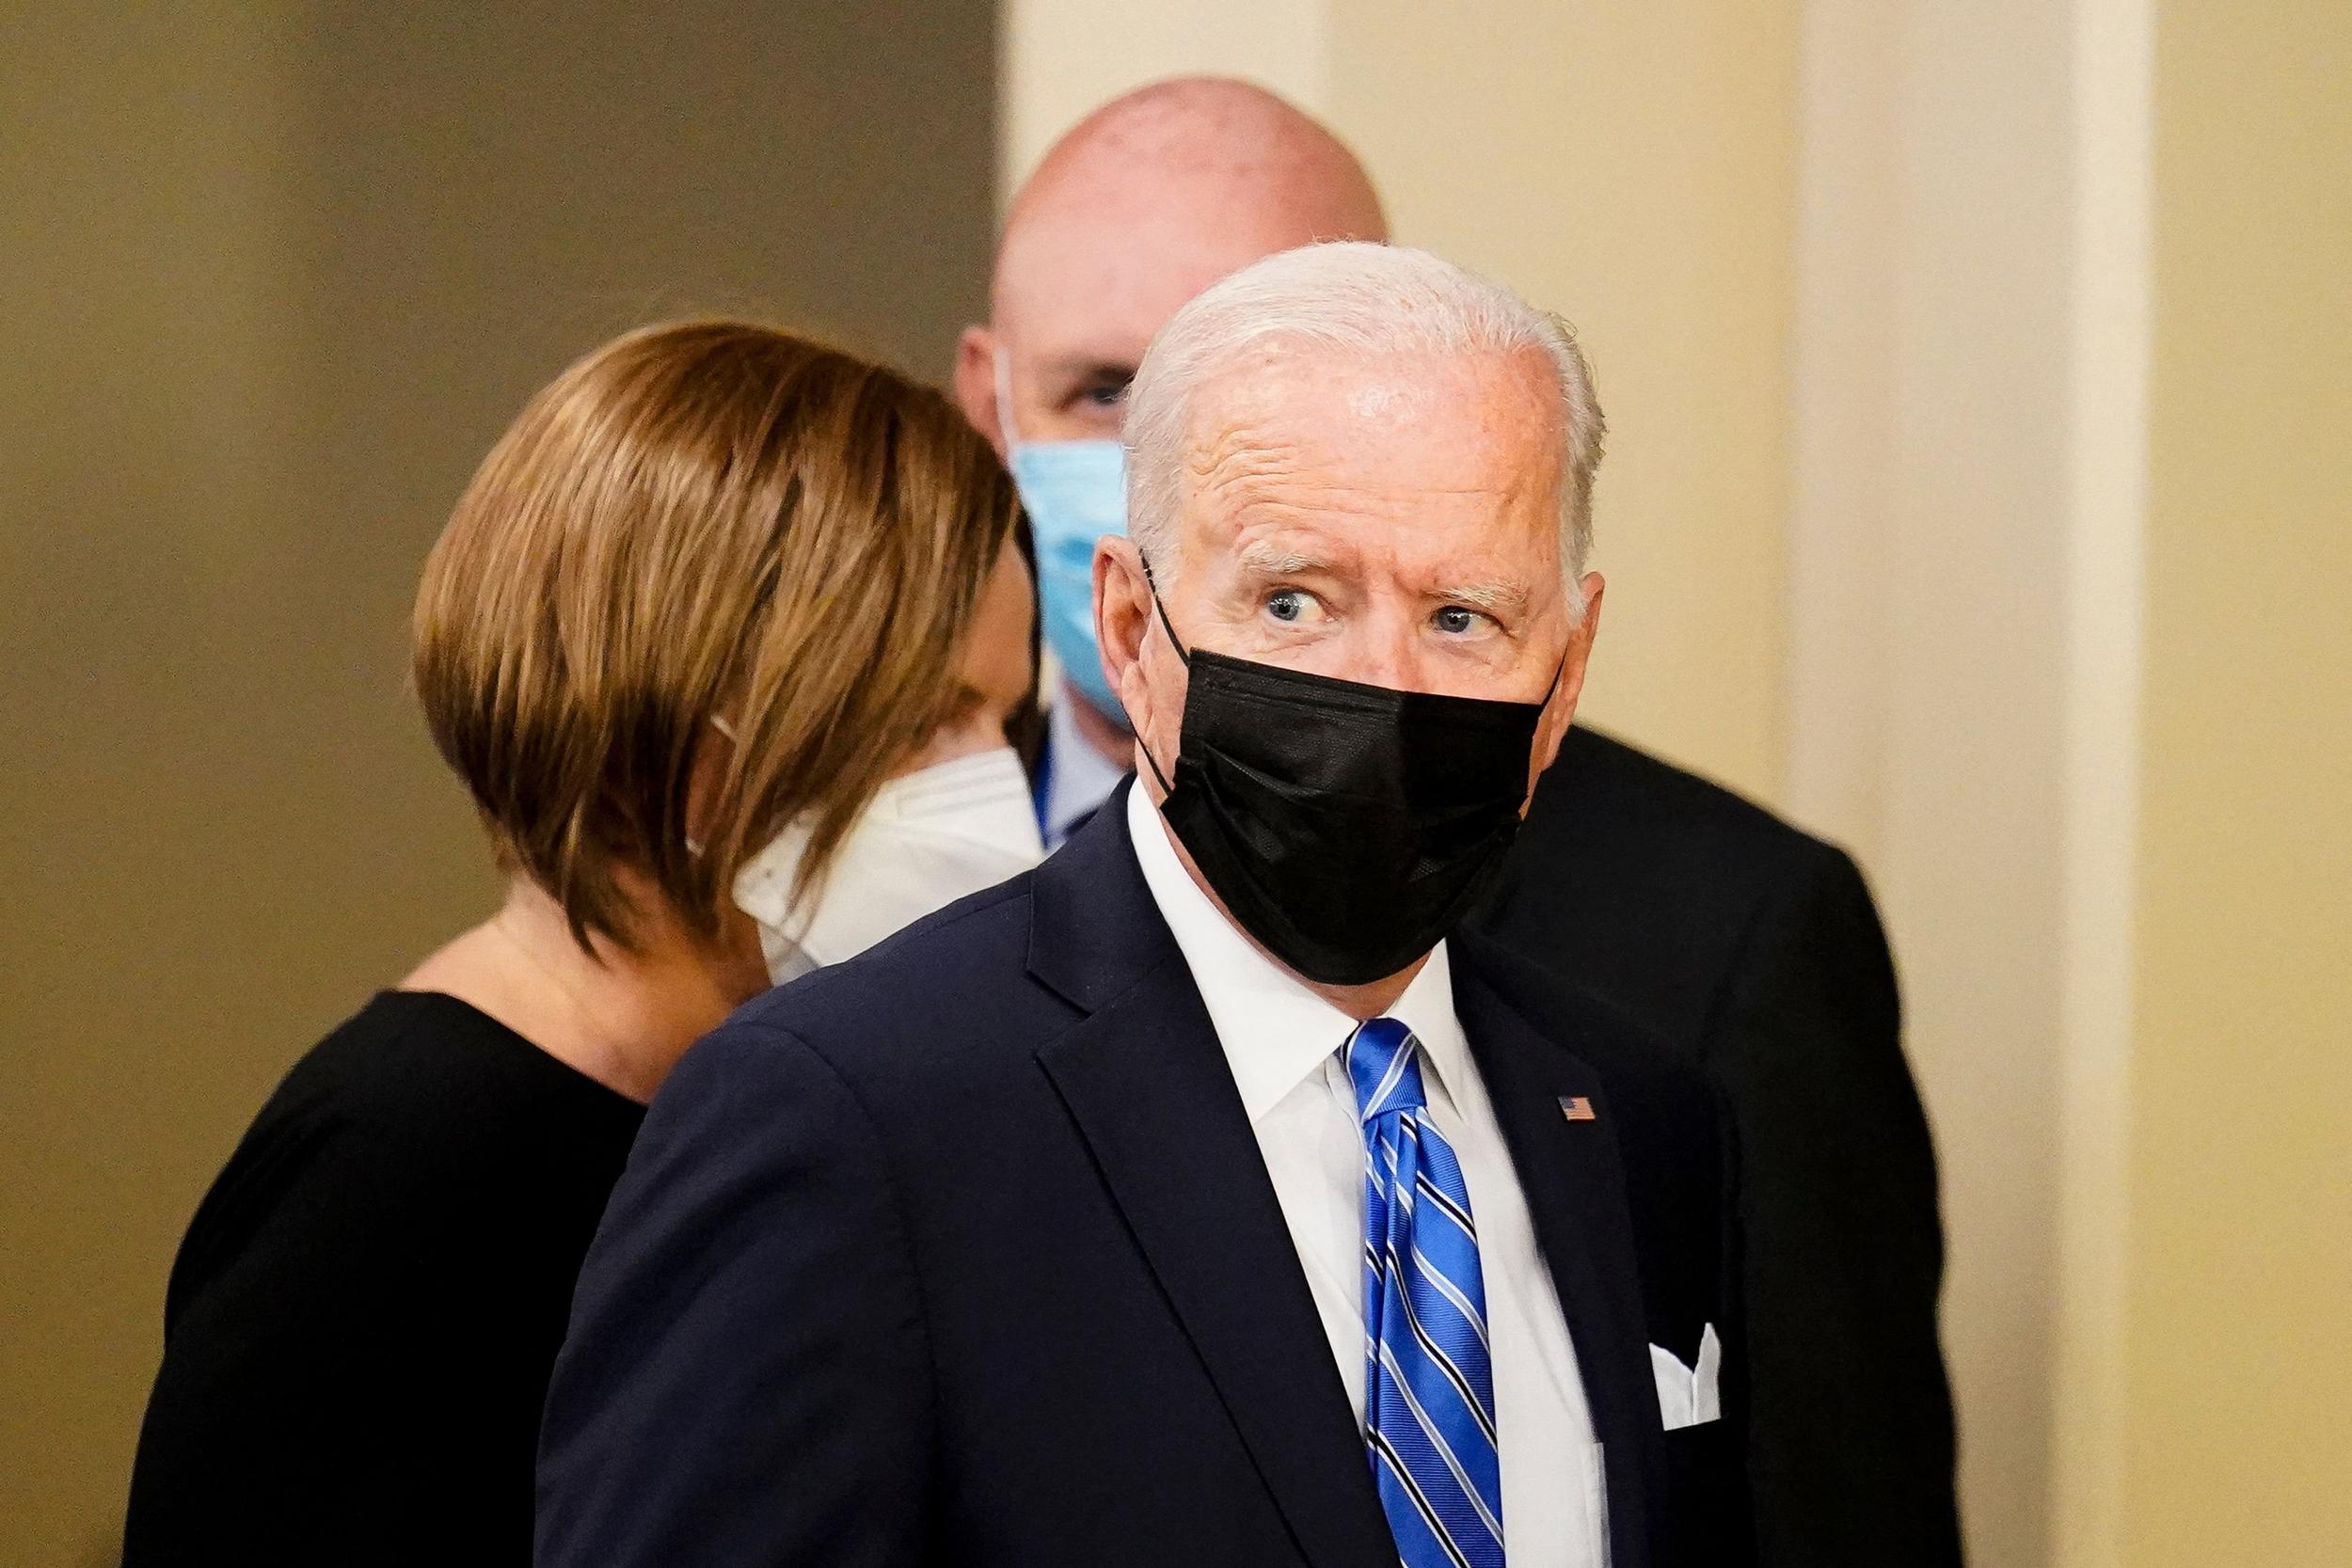 Biden steps into global spotlight at U.N. seeking to repair strained alliances